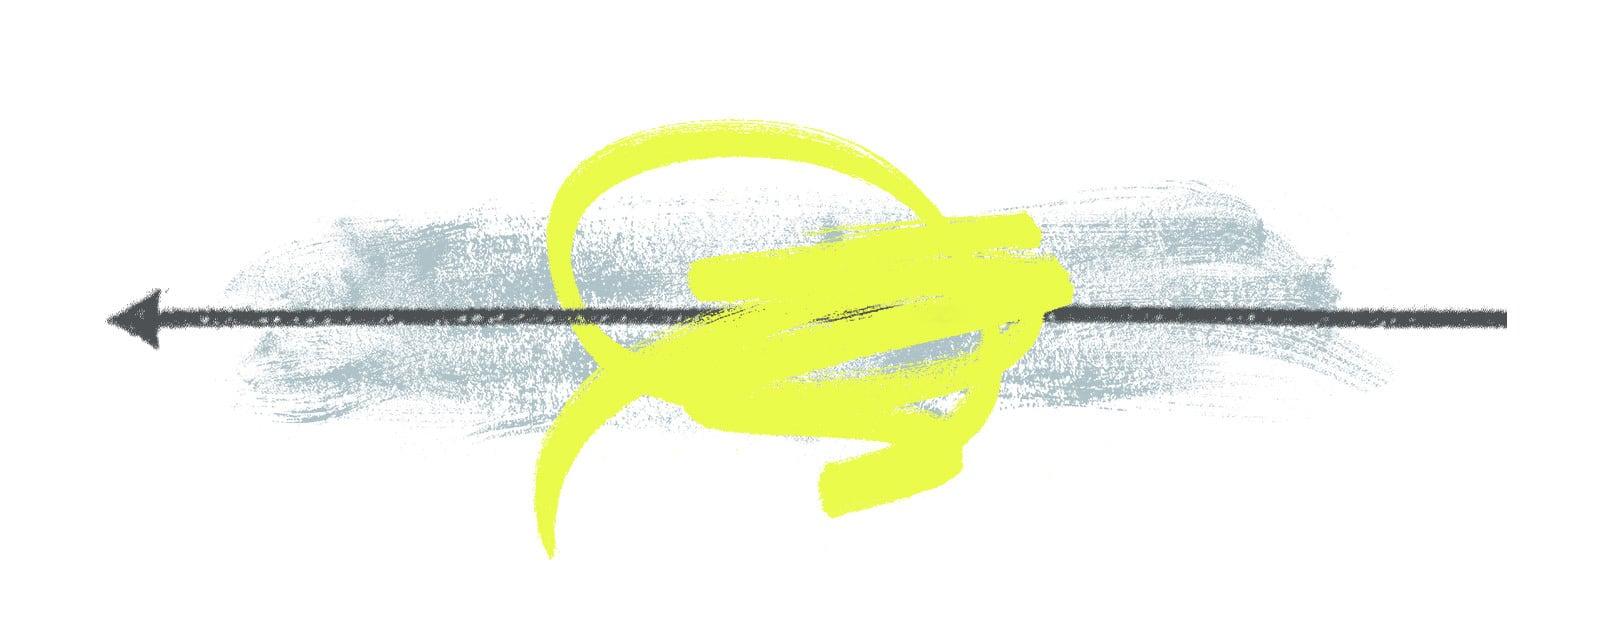 Scribbles_3.jpg#asset:1466